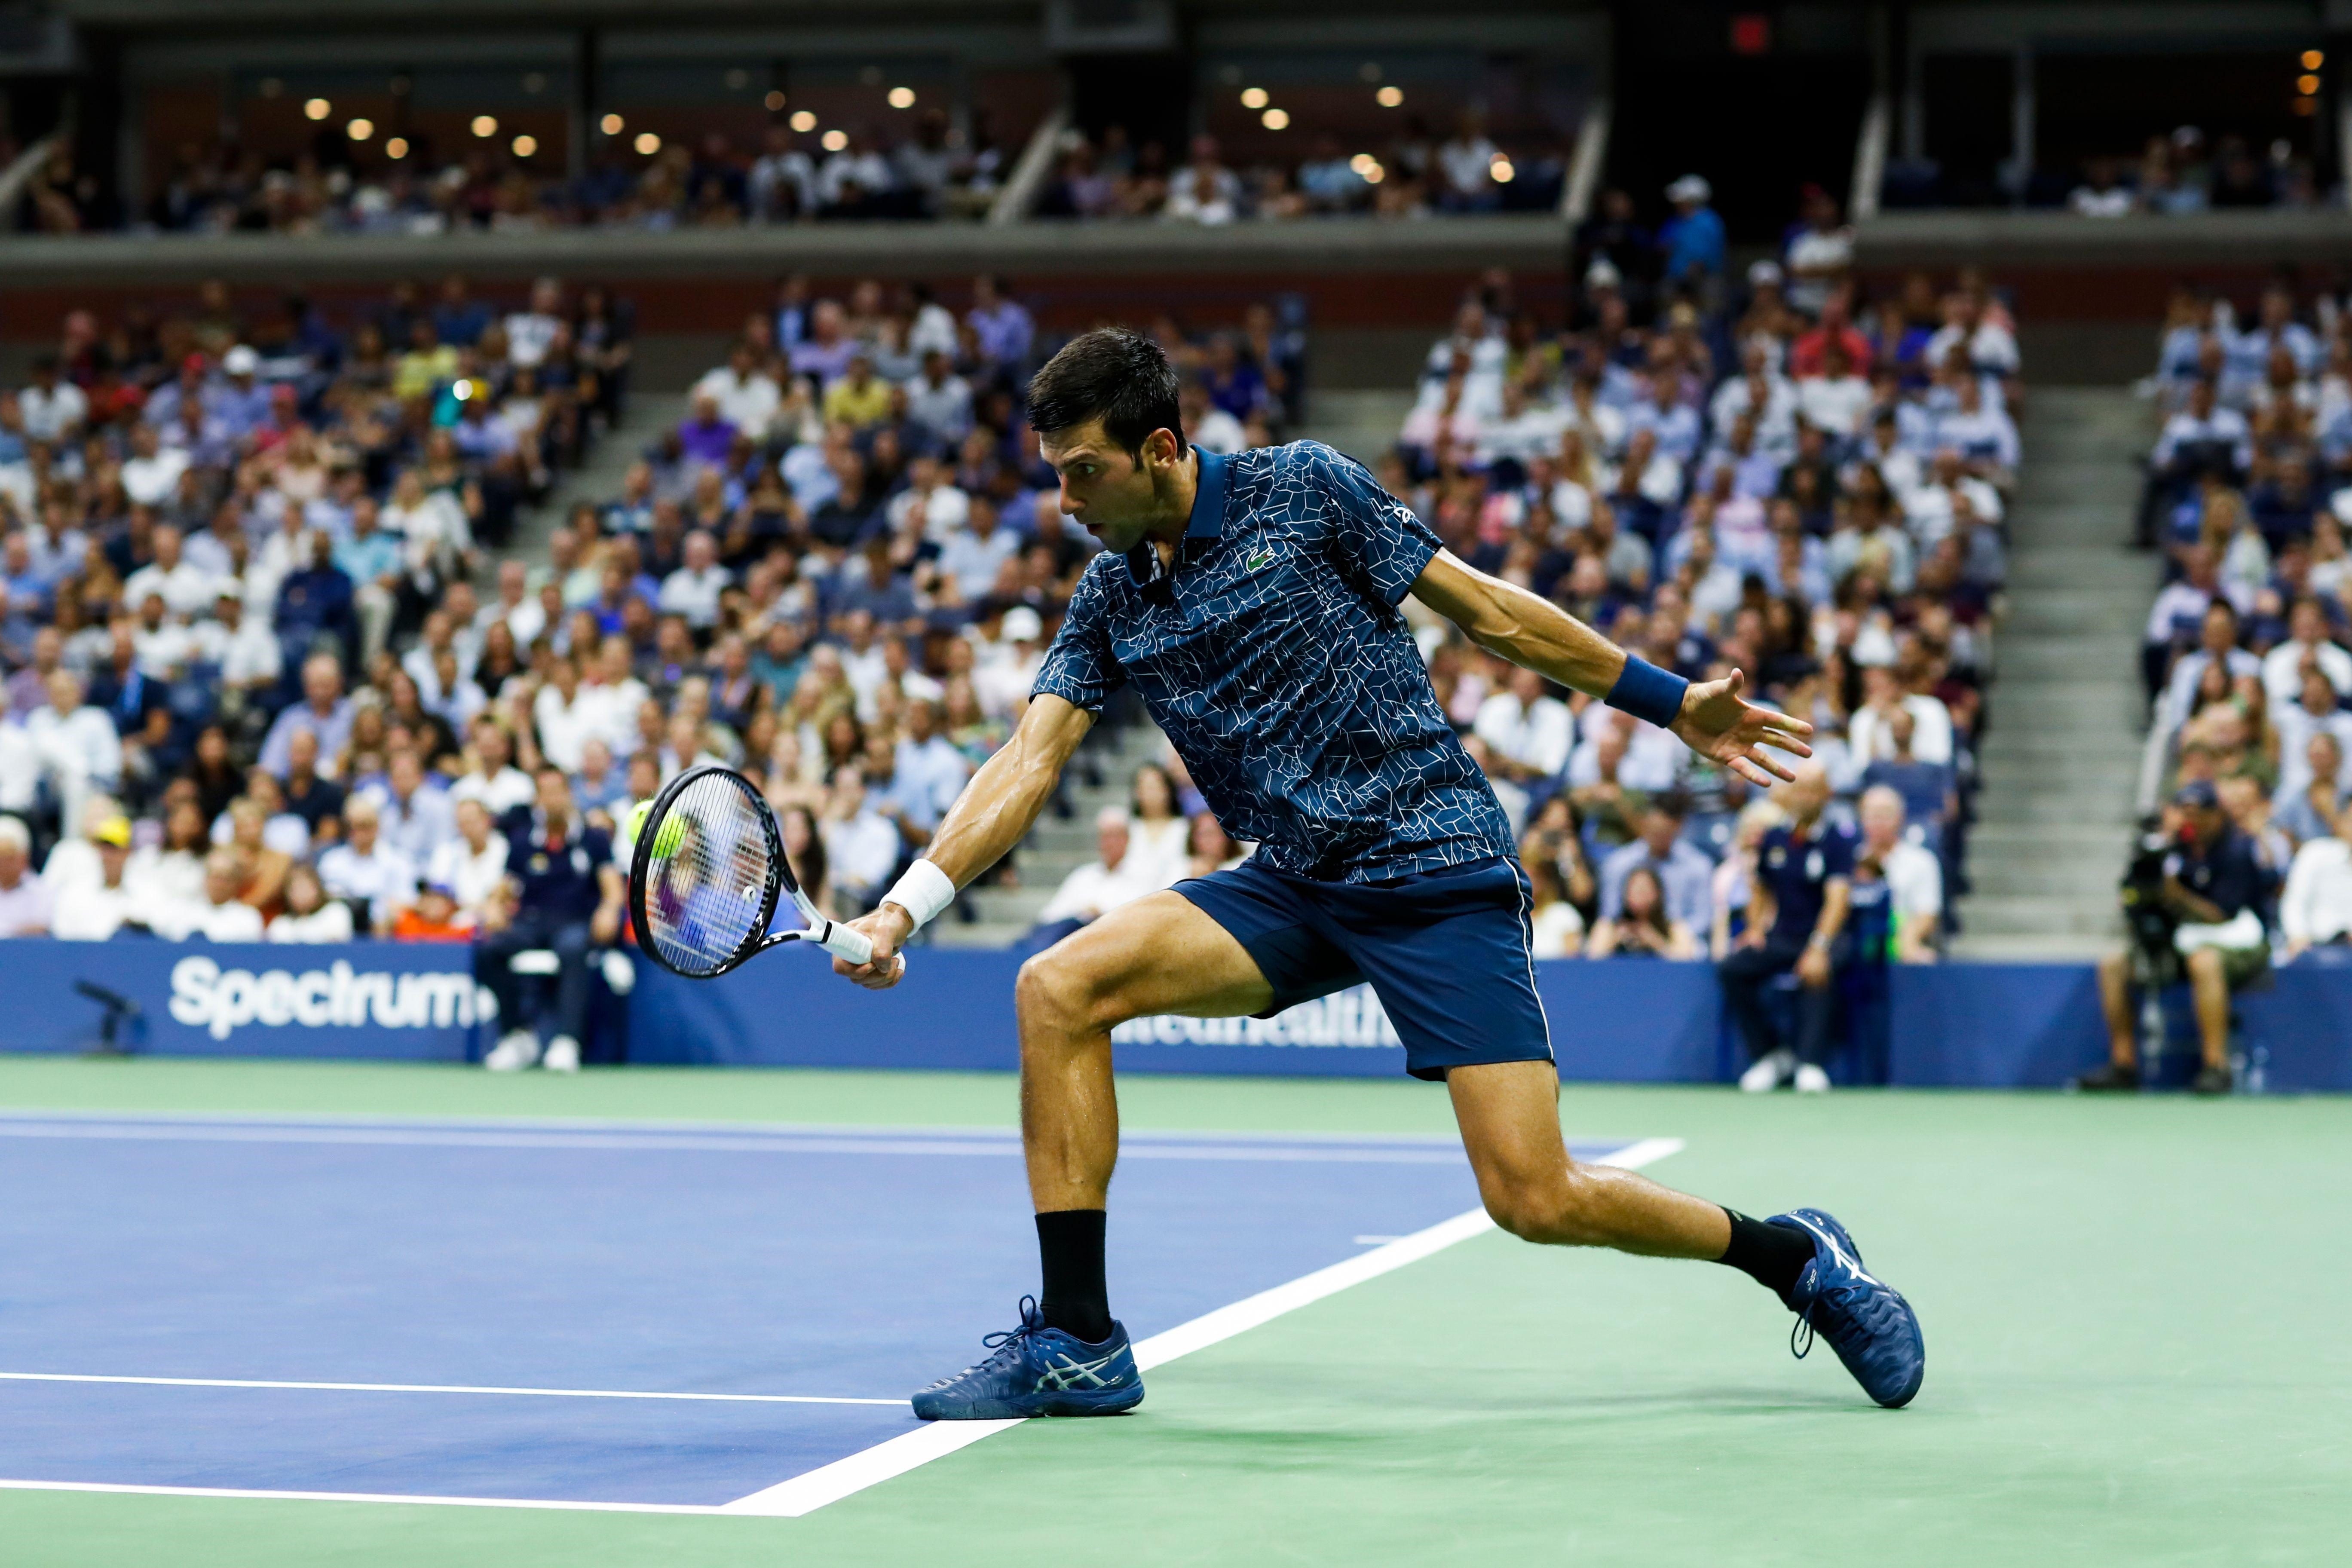 Novak Djokovic / US Open 2018